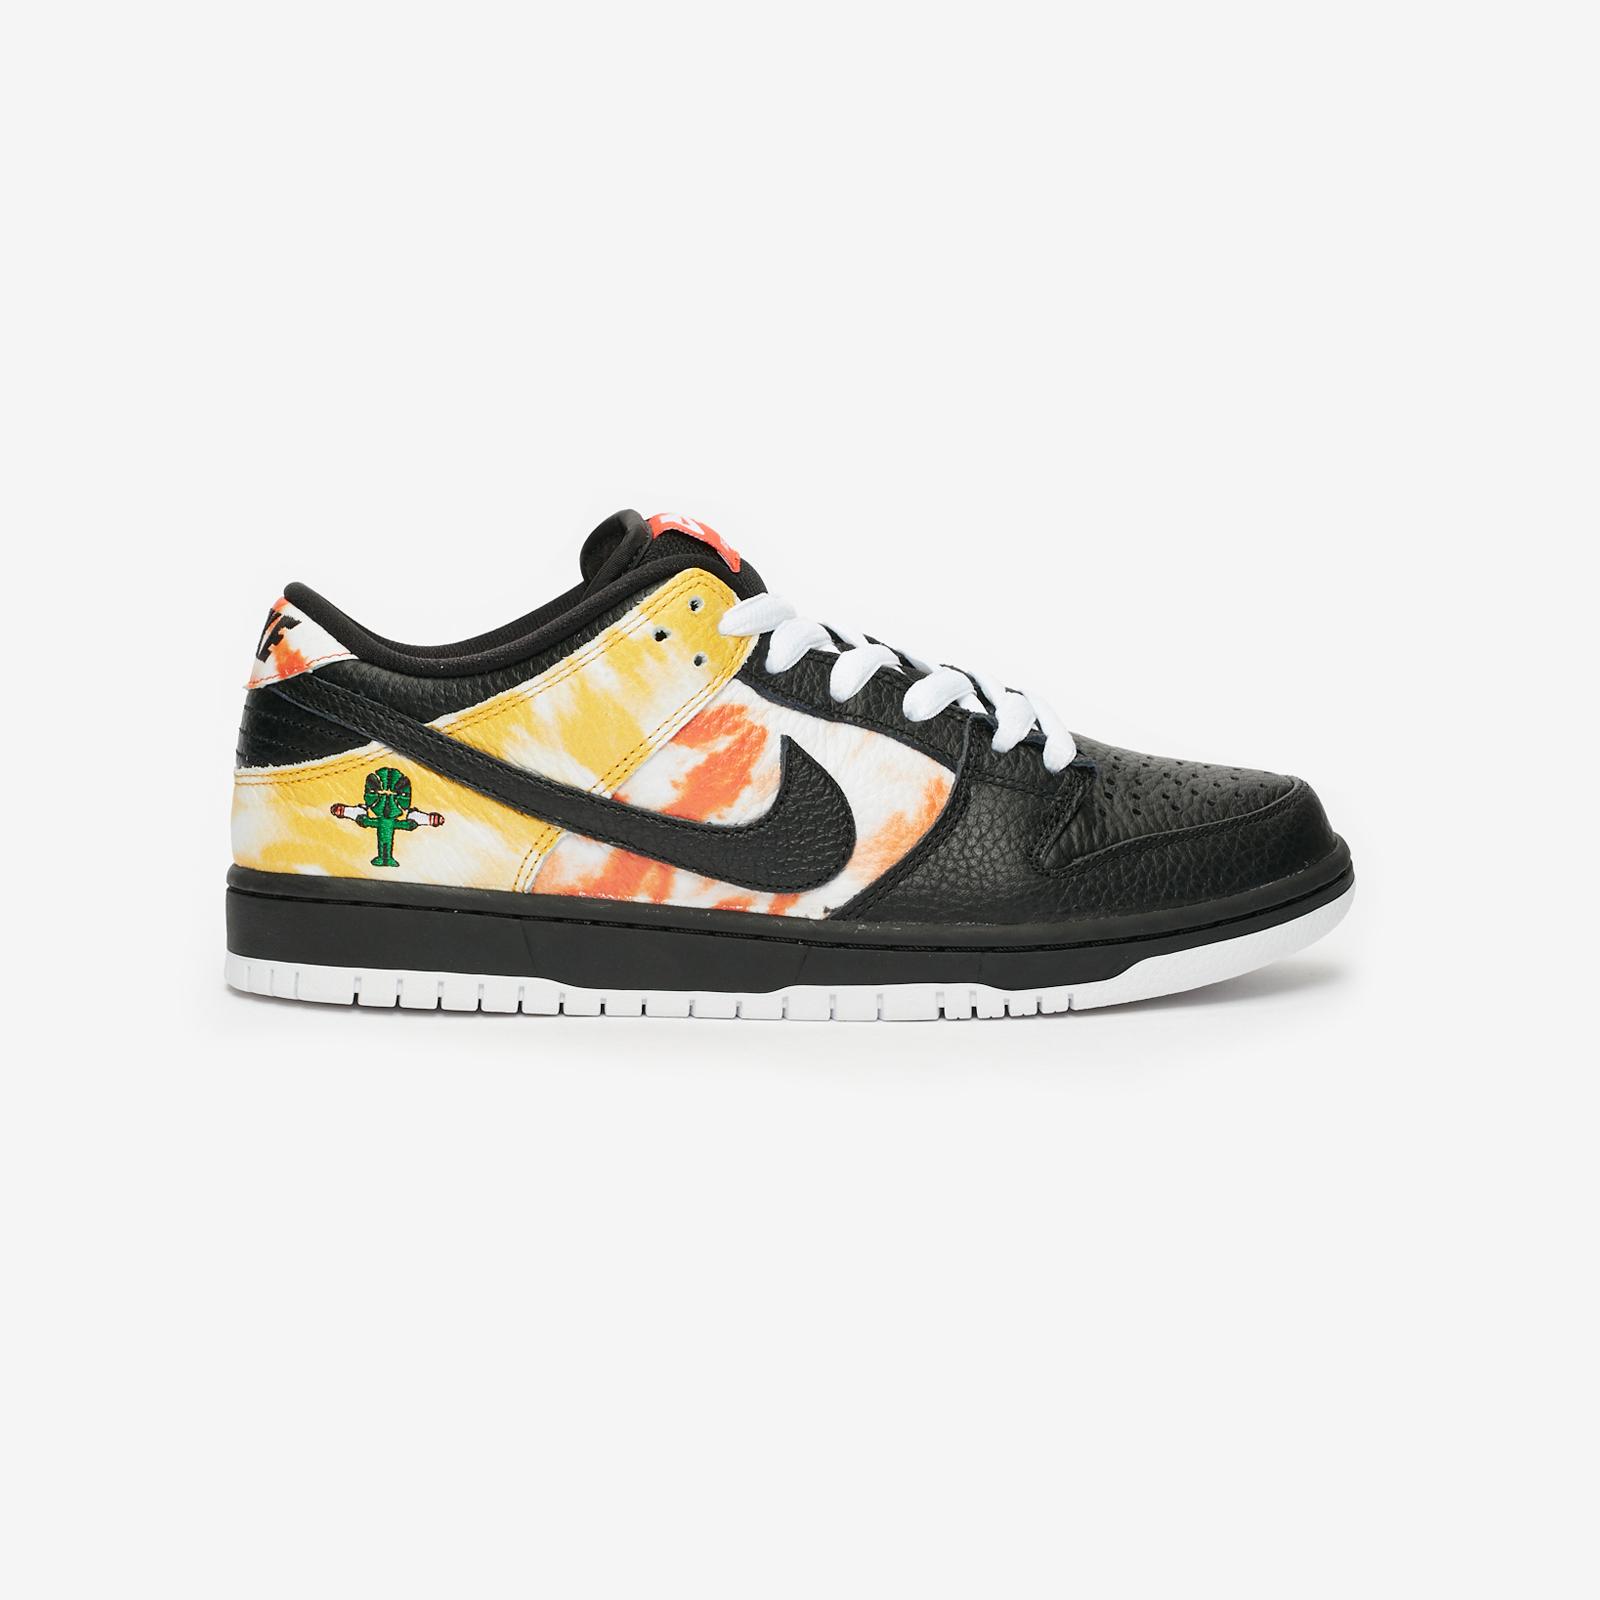 Nike SB Dunk Low Pro QS - Bq6832-001 - SNS   sneakers & streetwear ...